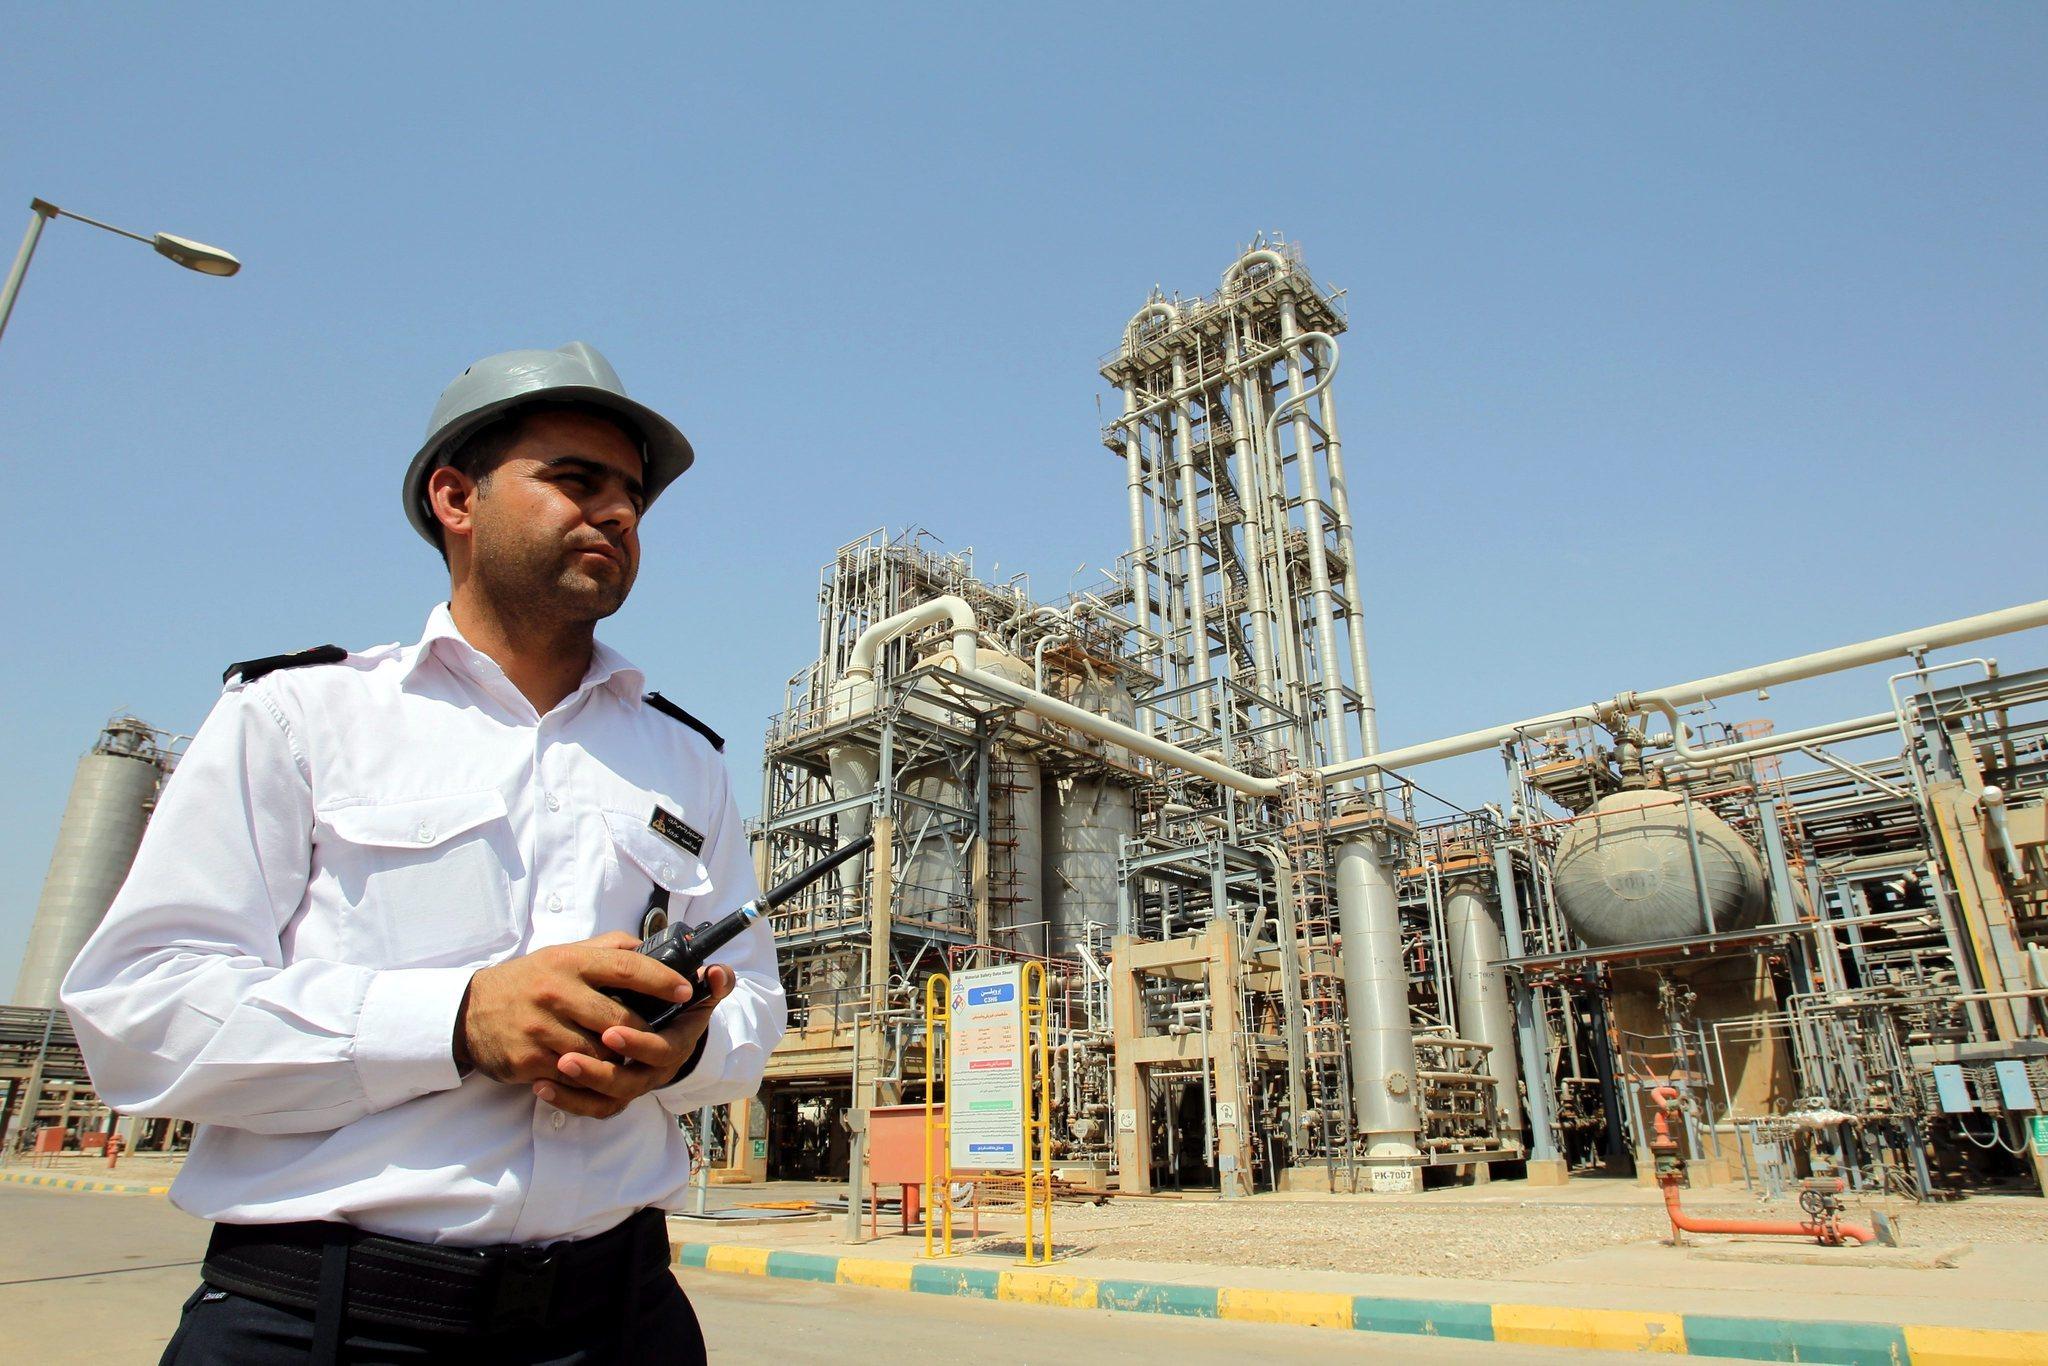 Saudi Arabia will 'mitigate' supply shortages